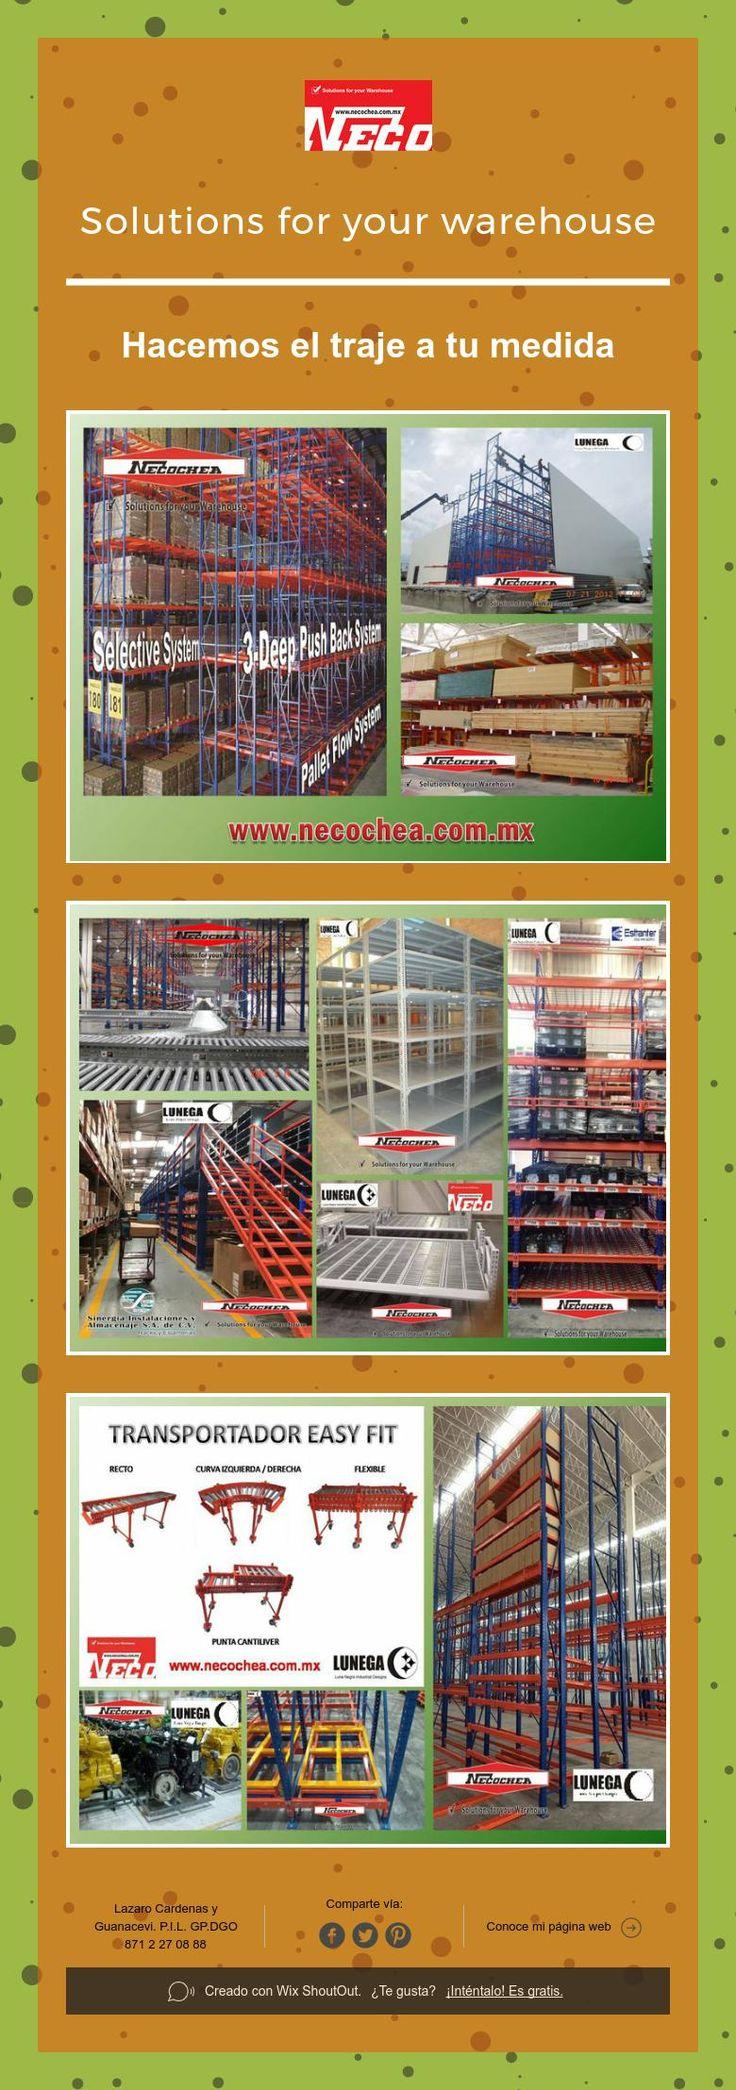 necochea estanteria metalica sistemas de almacenaje anaqueles metalicos racks industriales rack metalico racks